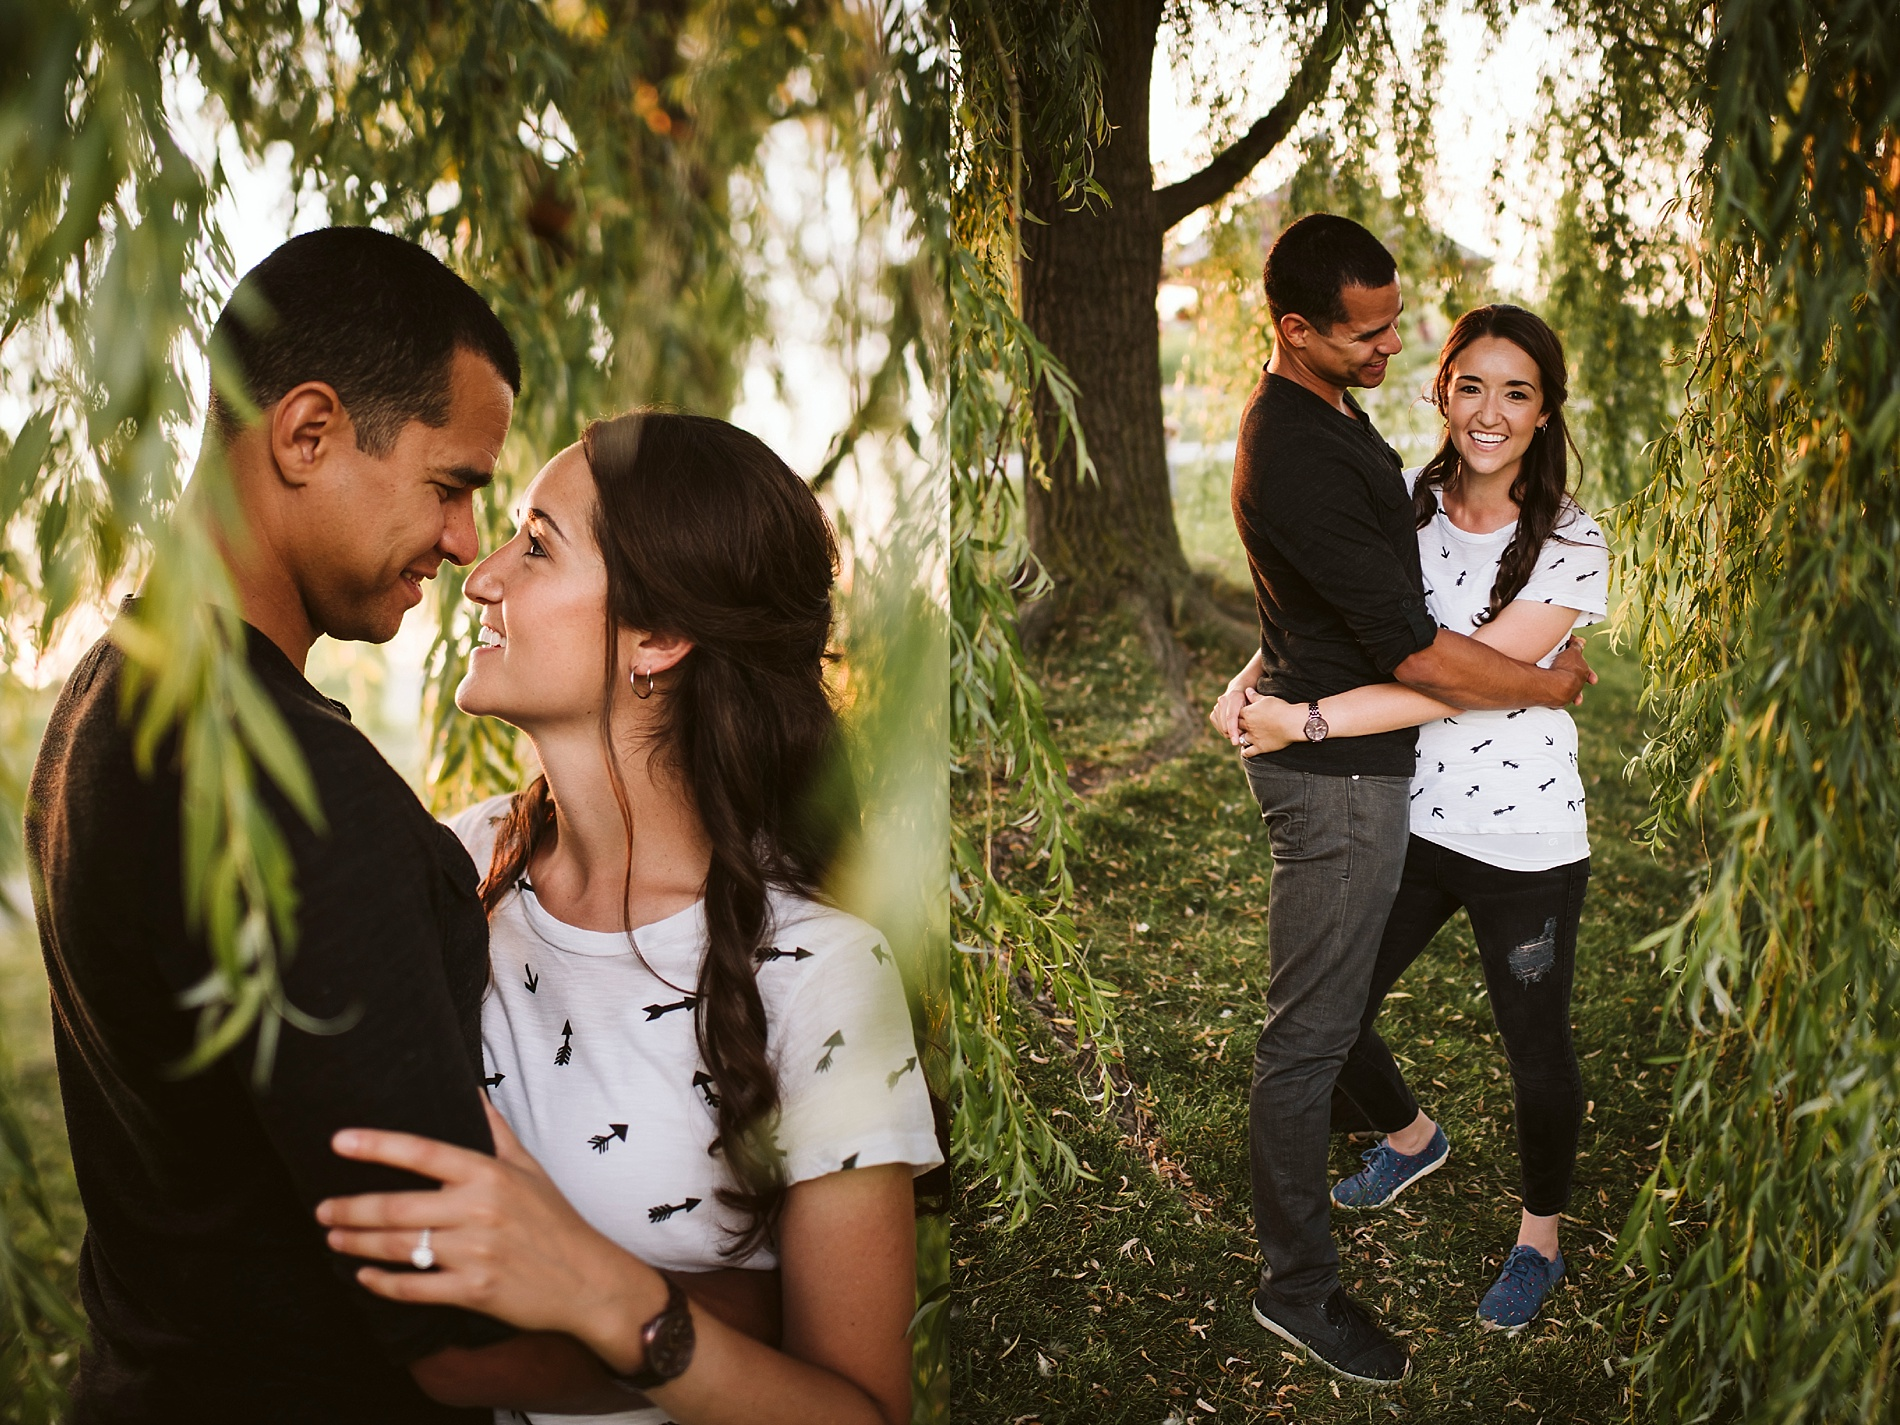 Richmond_Green_Engagement_shoot_Toronto_Wedding_Photographer14.jpg